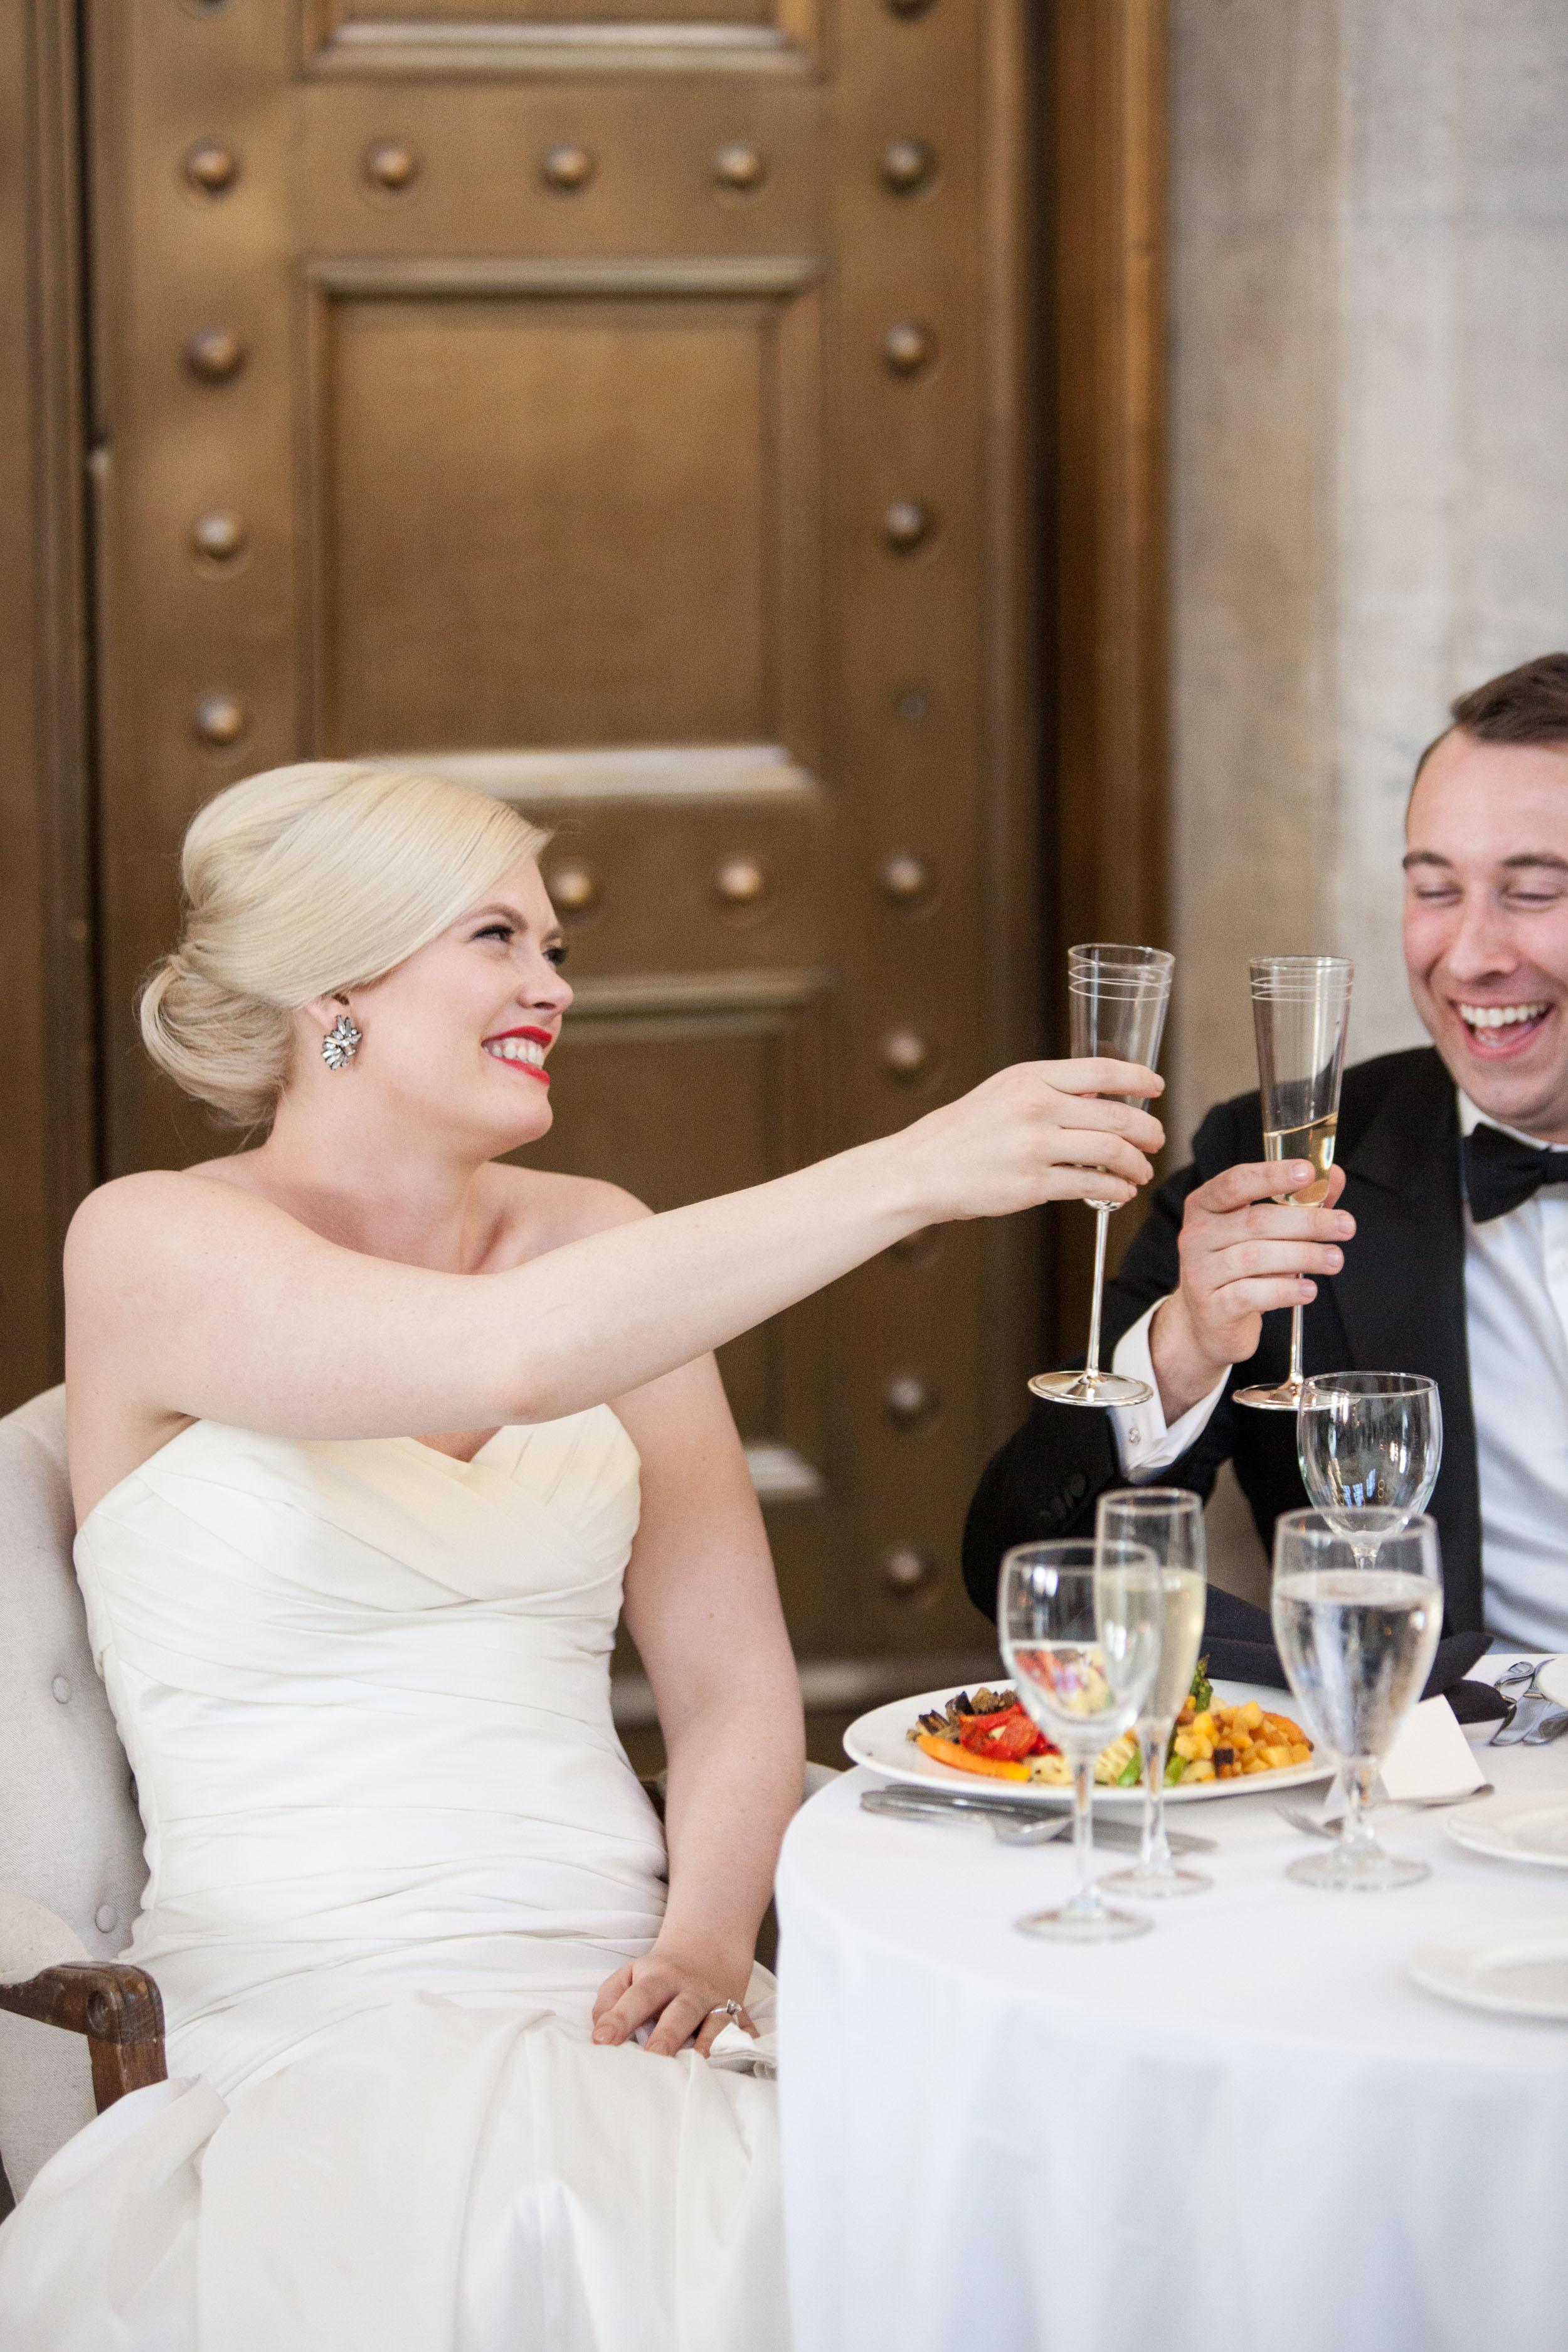 Cottrell Wedding - Natalie Probst Photography669.jpg